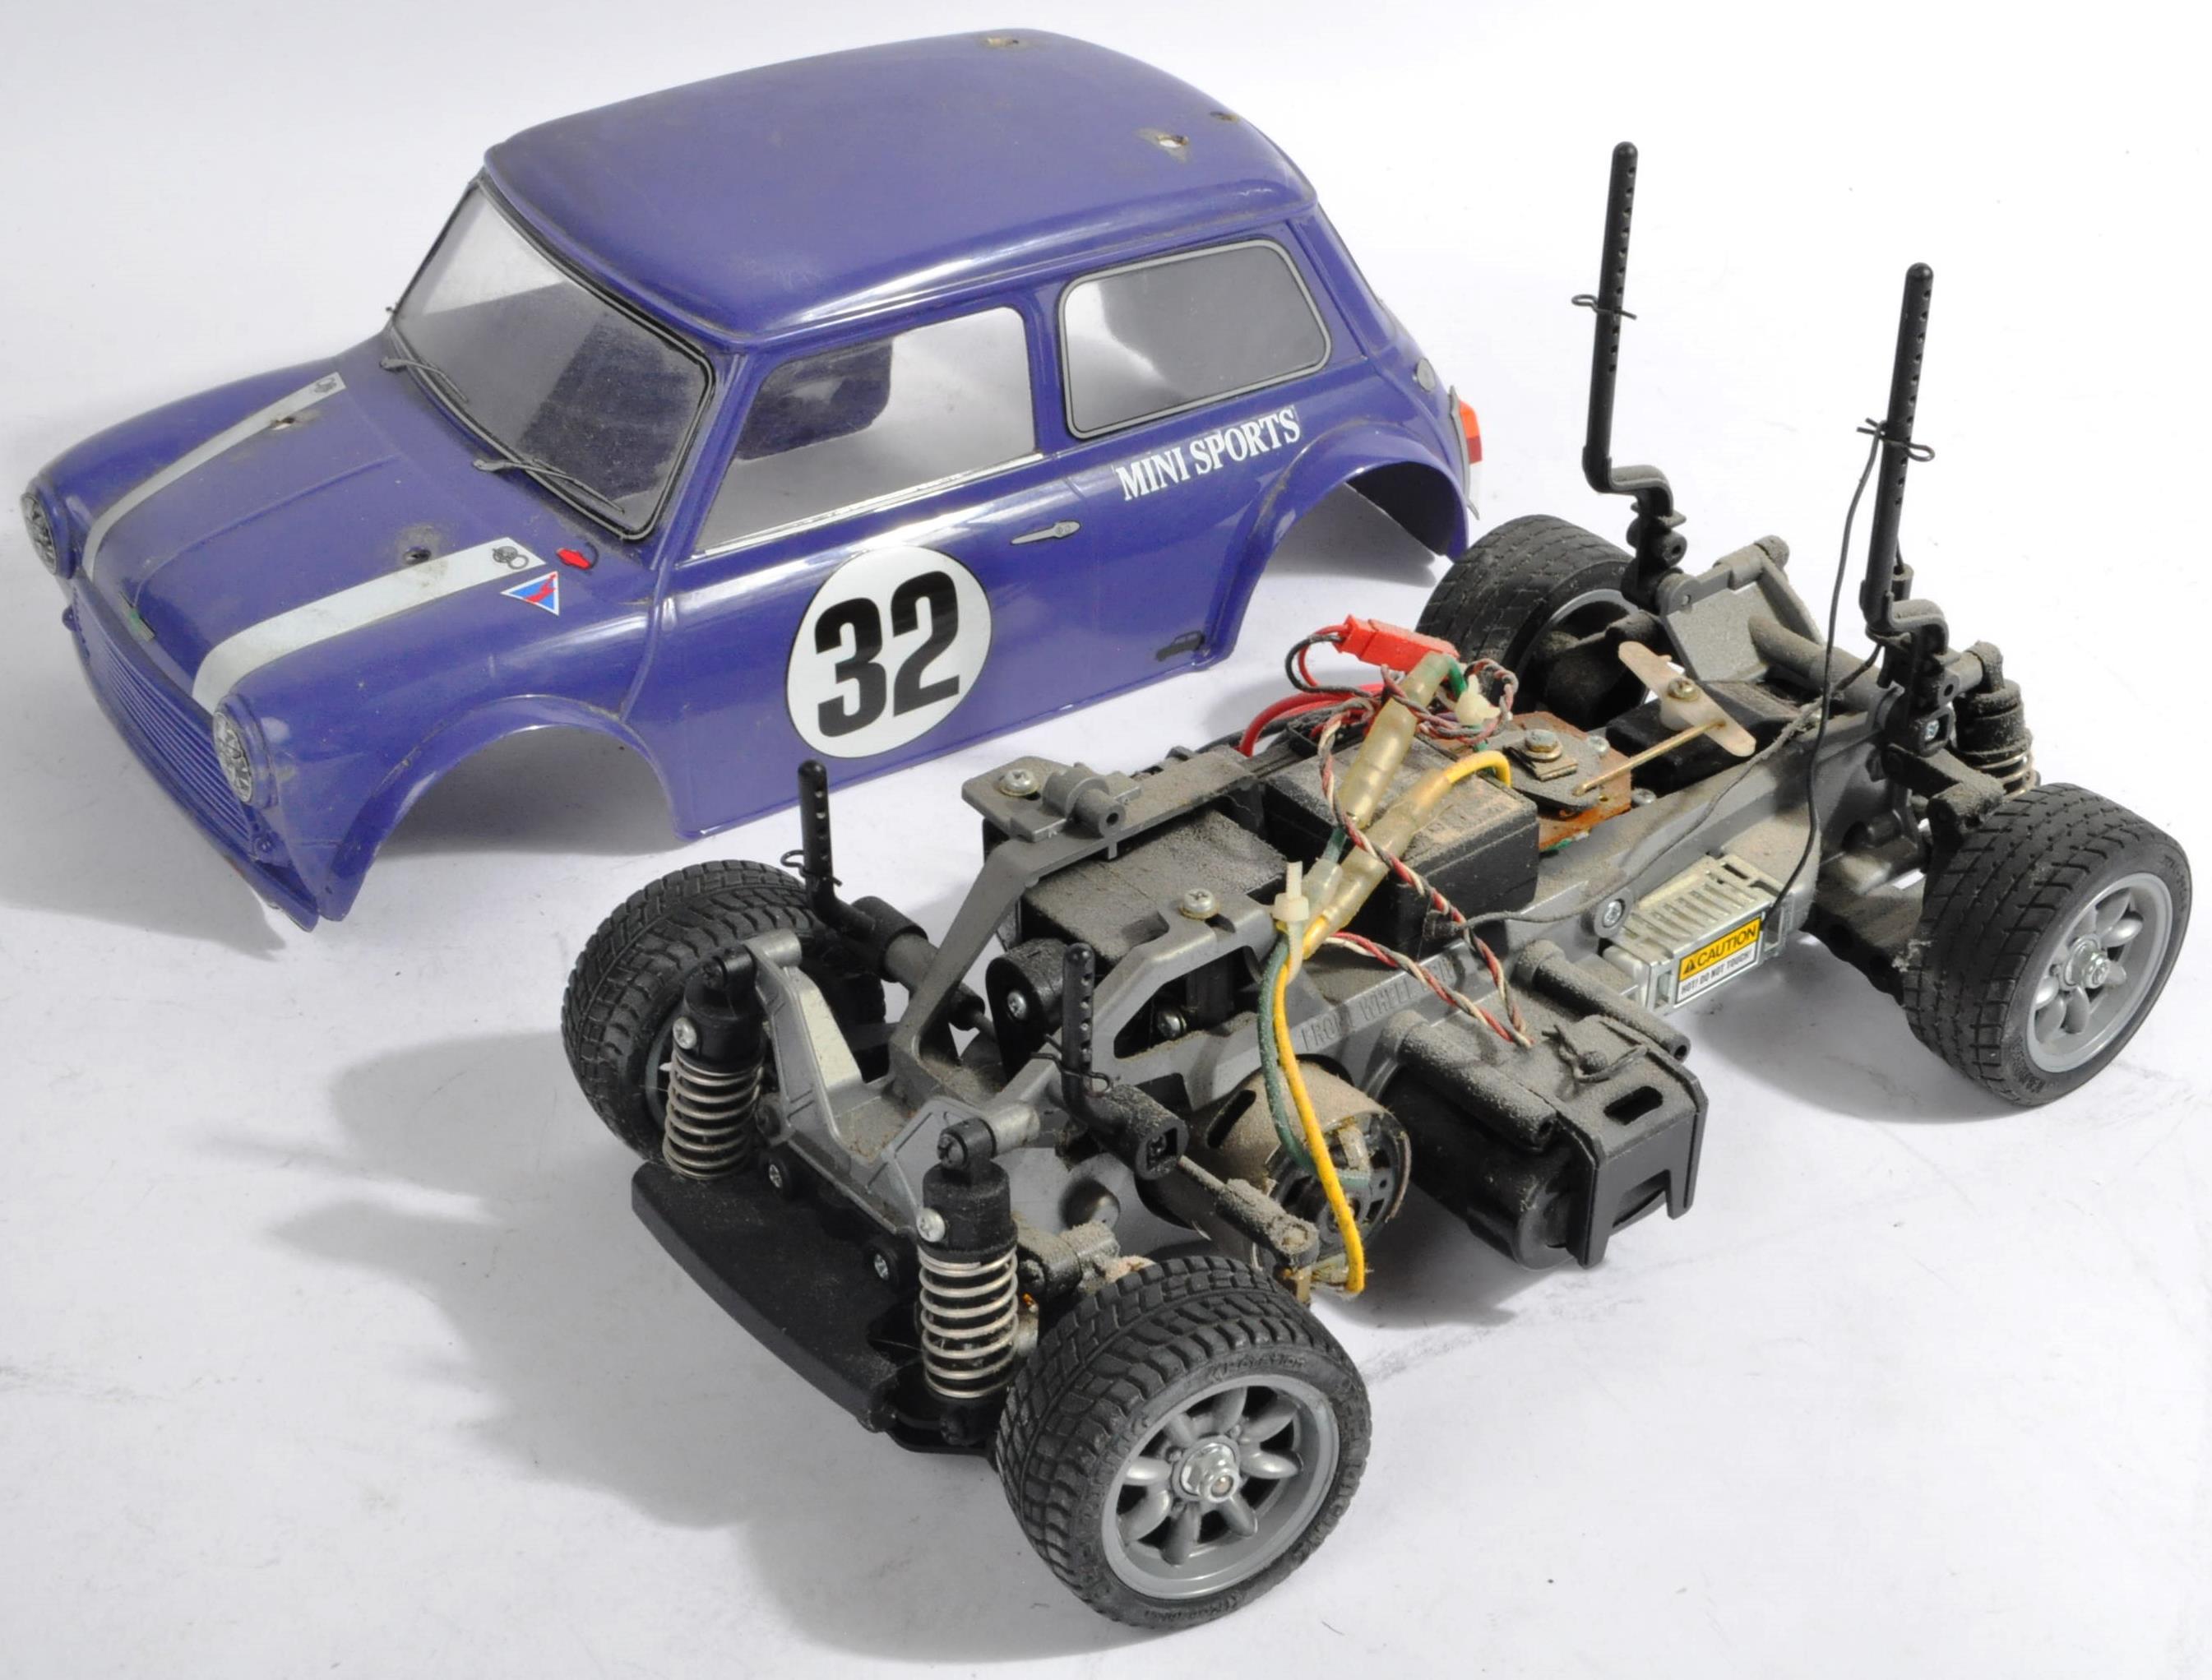 TAMIYA - TWO VINTAGE MINI COOPER RACING RC RADIO CONTROLLED CARS - Image 2 of 5